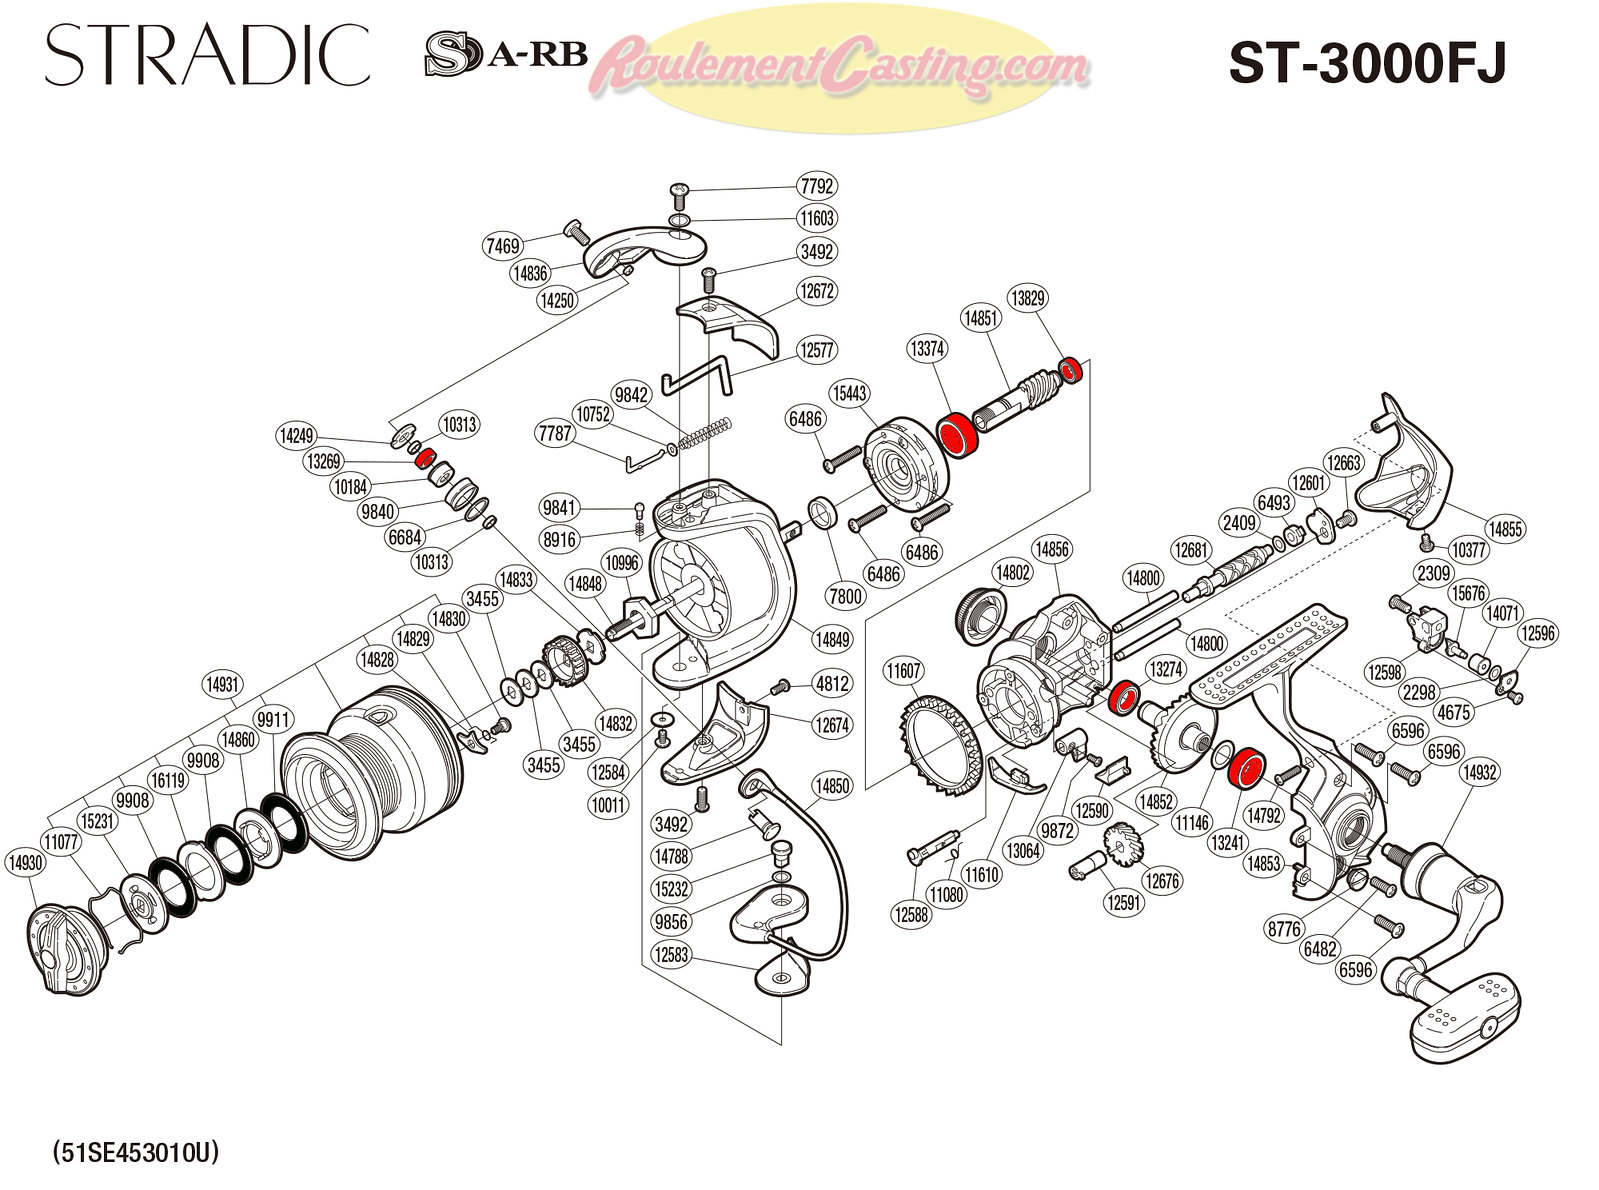 Schema-Stradic-3000FJ